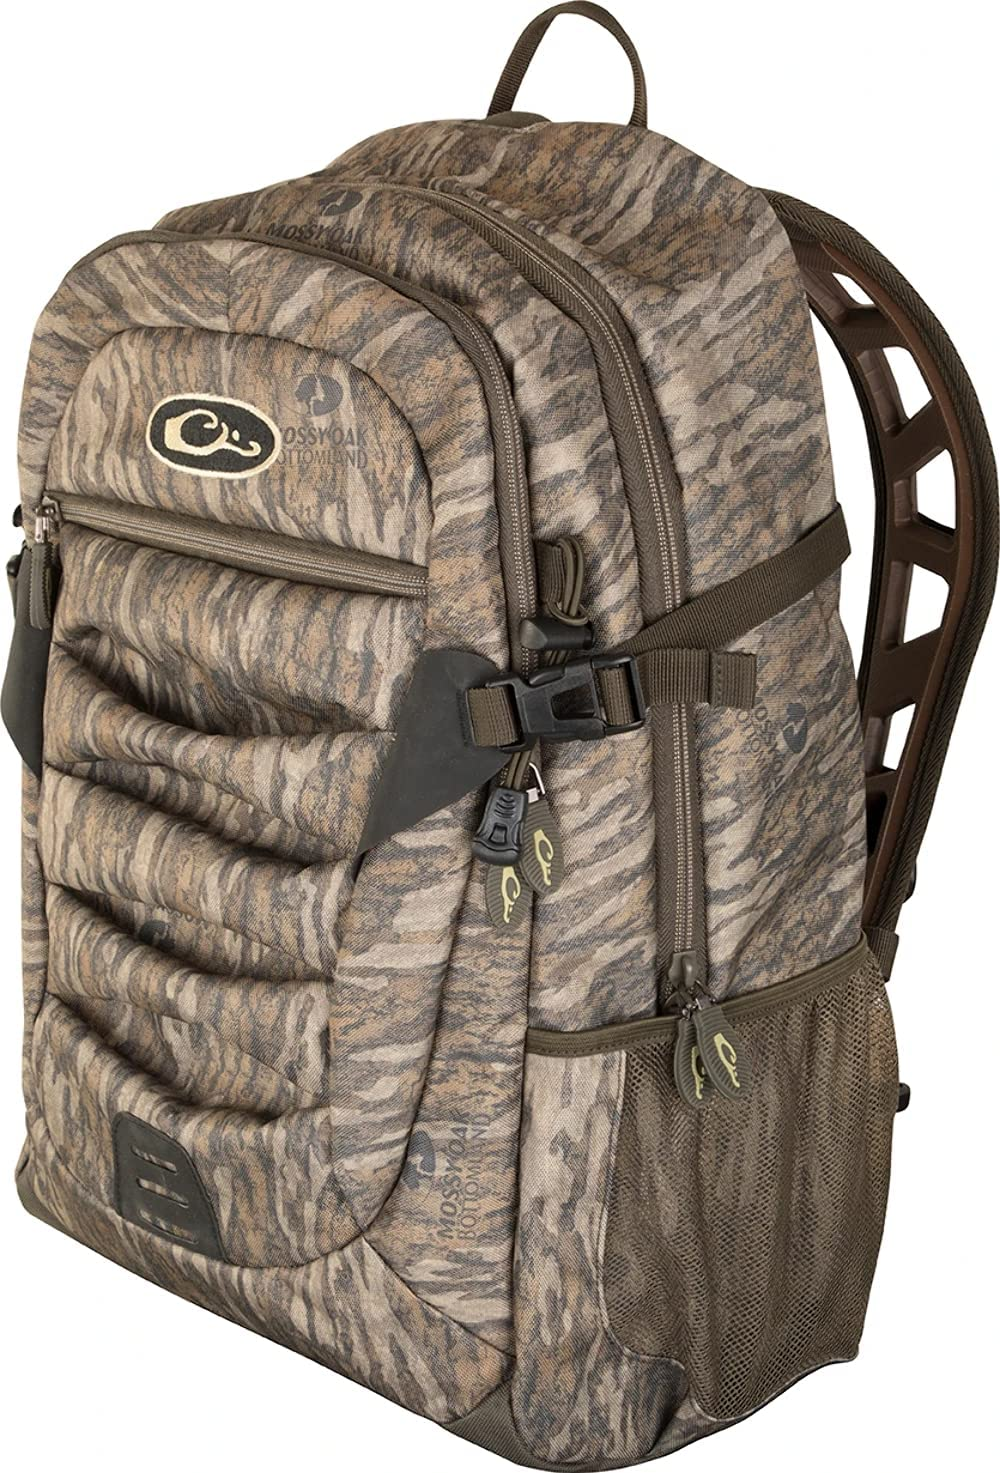 Drake Waterfowl National uniform free shipping 1 year warranty Camo Daypack